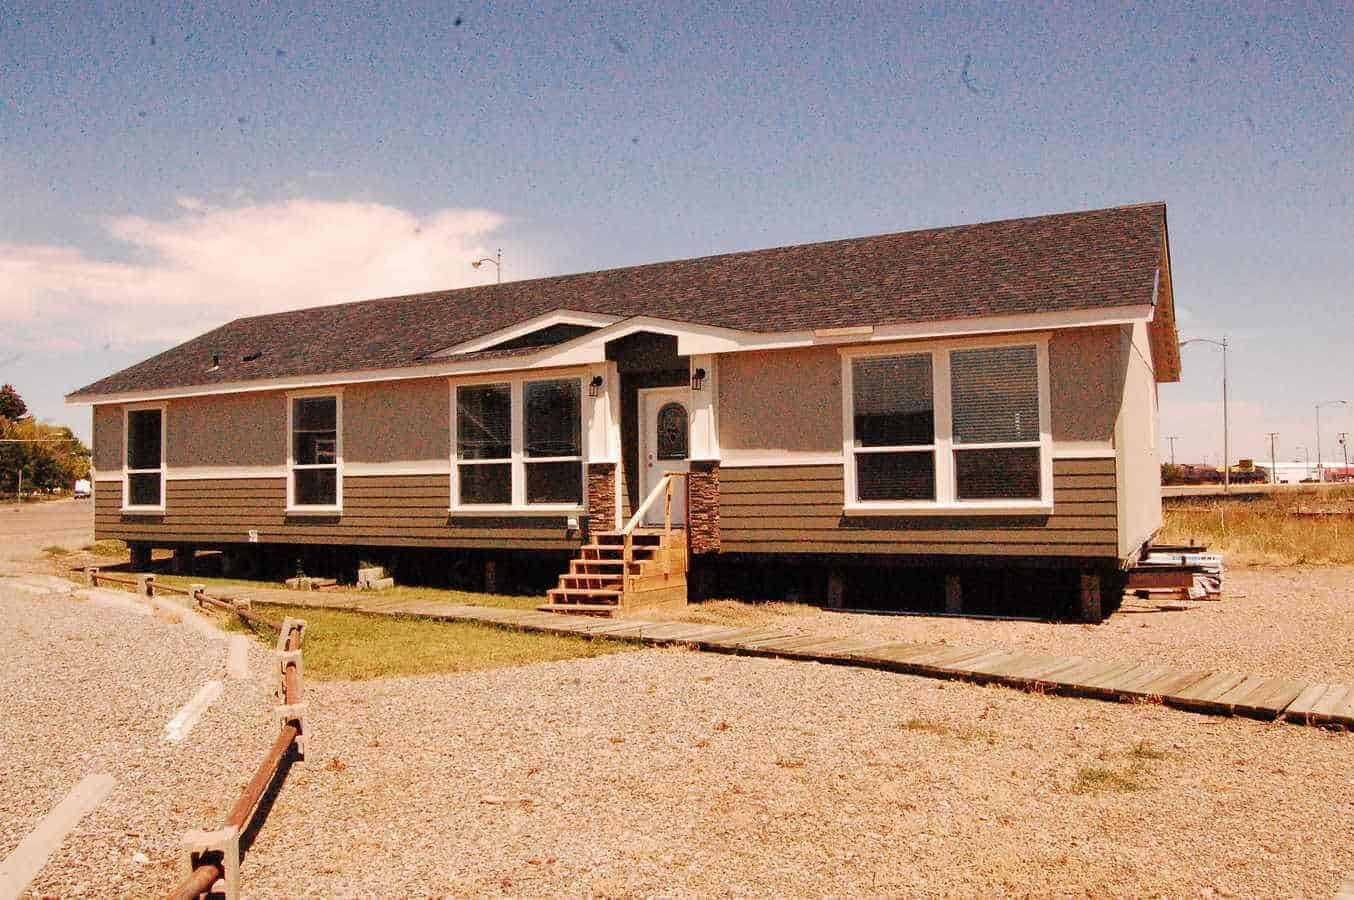 NEW MODULAR Fleetwood Barrington ORDER NOW 3 OR 4 BEDROOM - Rangitsch Manufactured Home Center